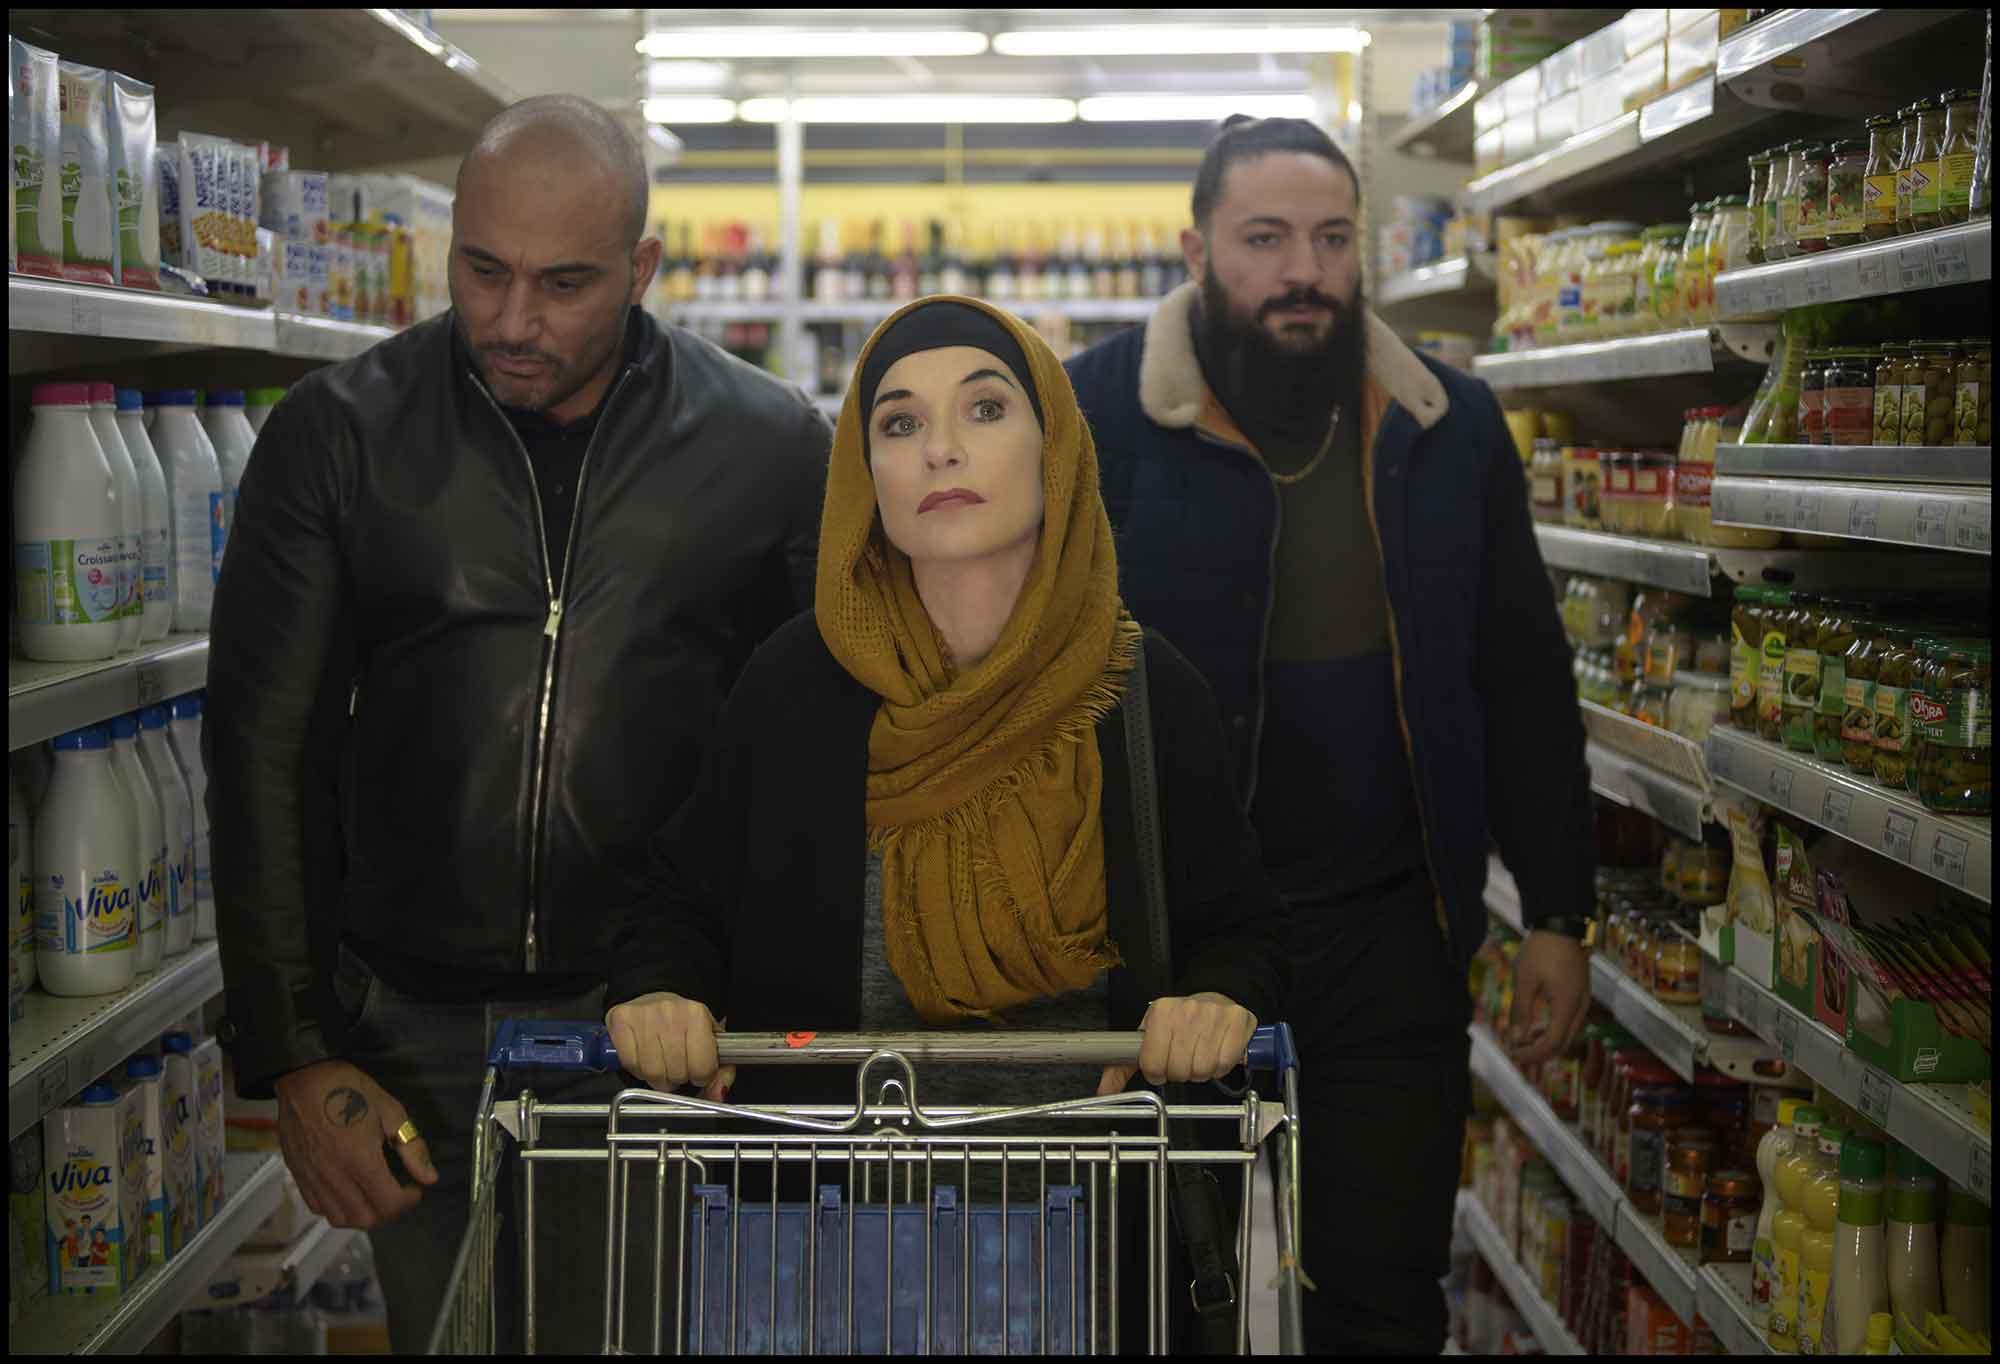 La padrina - Parigi ha una nuova regina recensione film con Isabelle Huppert